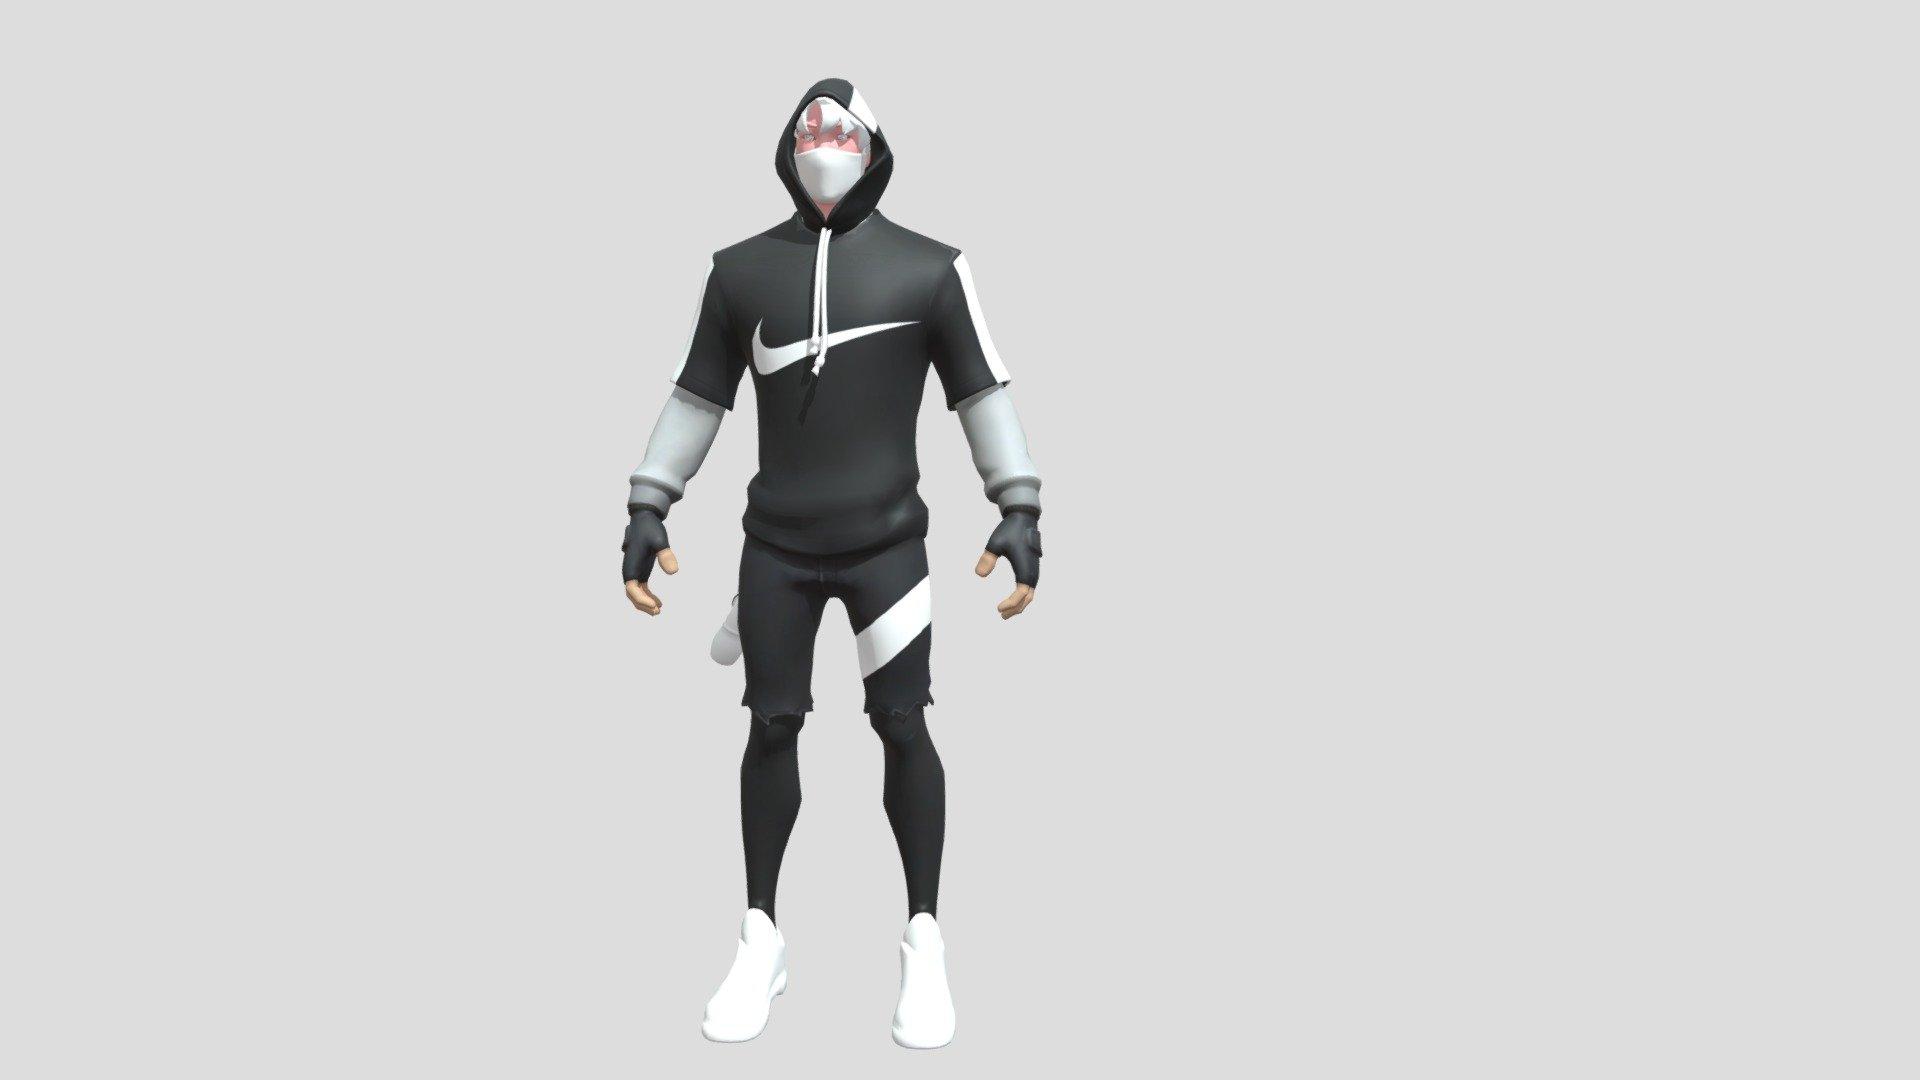 Fortnite Skin Ikonik X Nike Download Free 3d Model By Fabien Rdz 38 Fabien Rdz 38 1725c2c Sketchfab